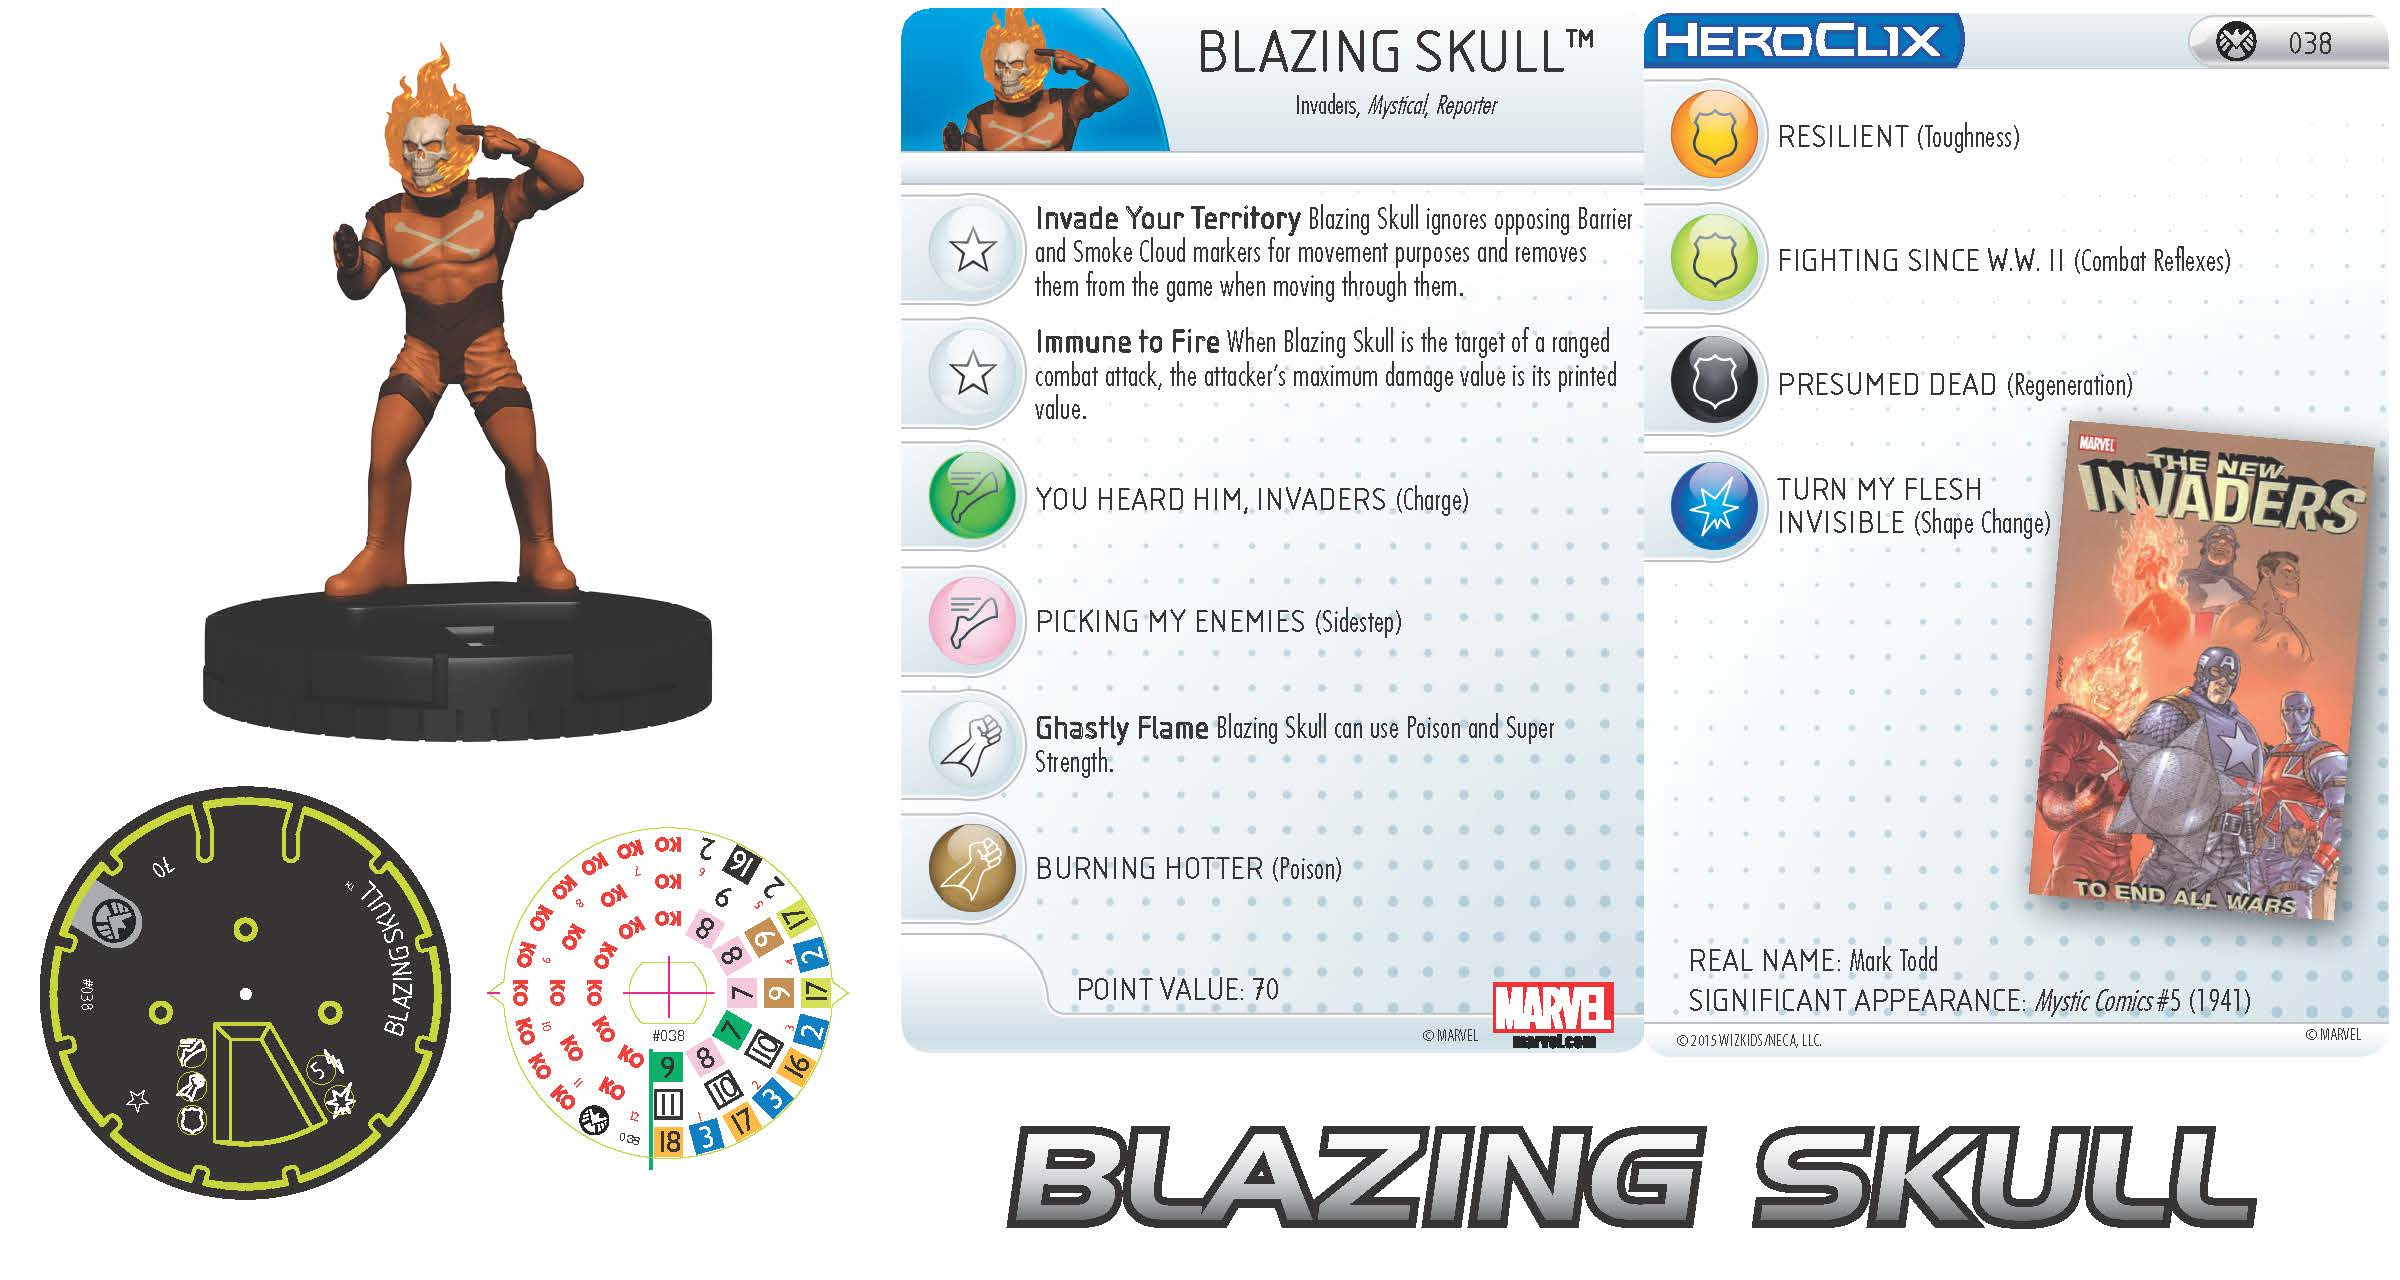 Marvel HeroClix: Nick Fury, Agent of S.H.I.E.L.D.- Blazing Skull